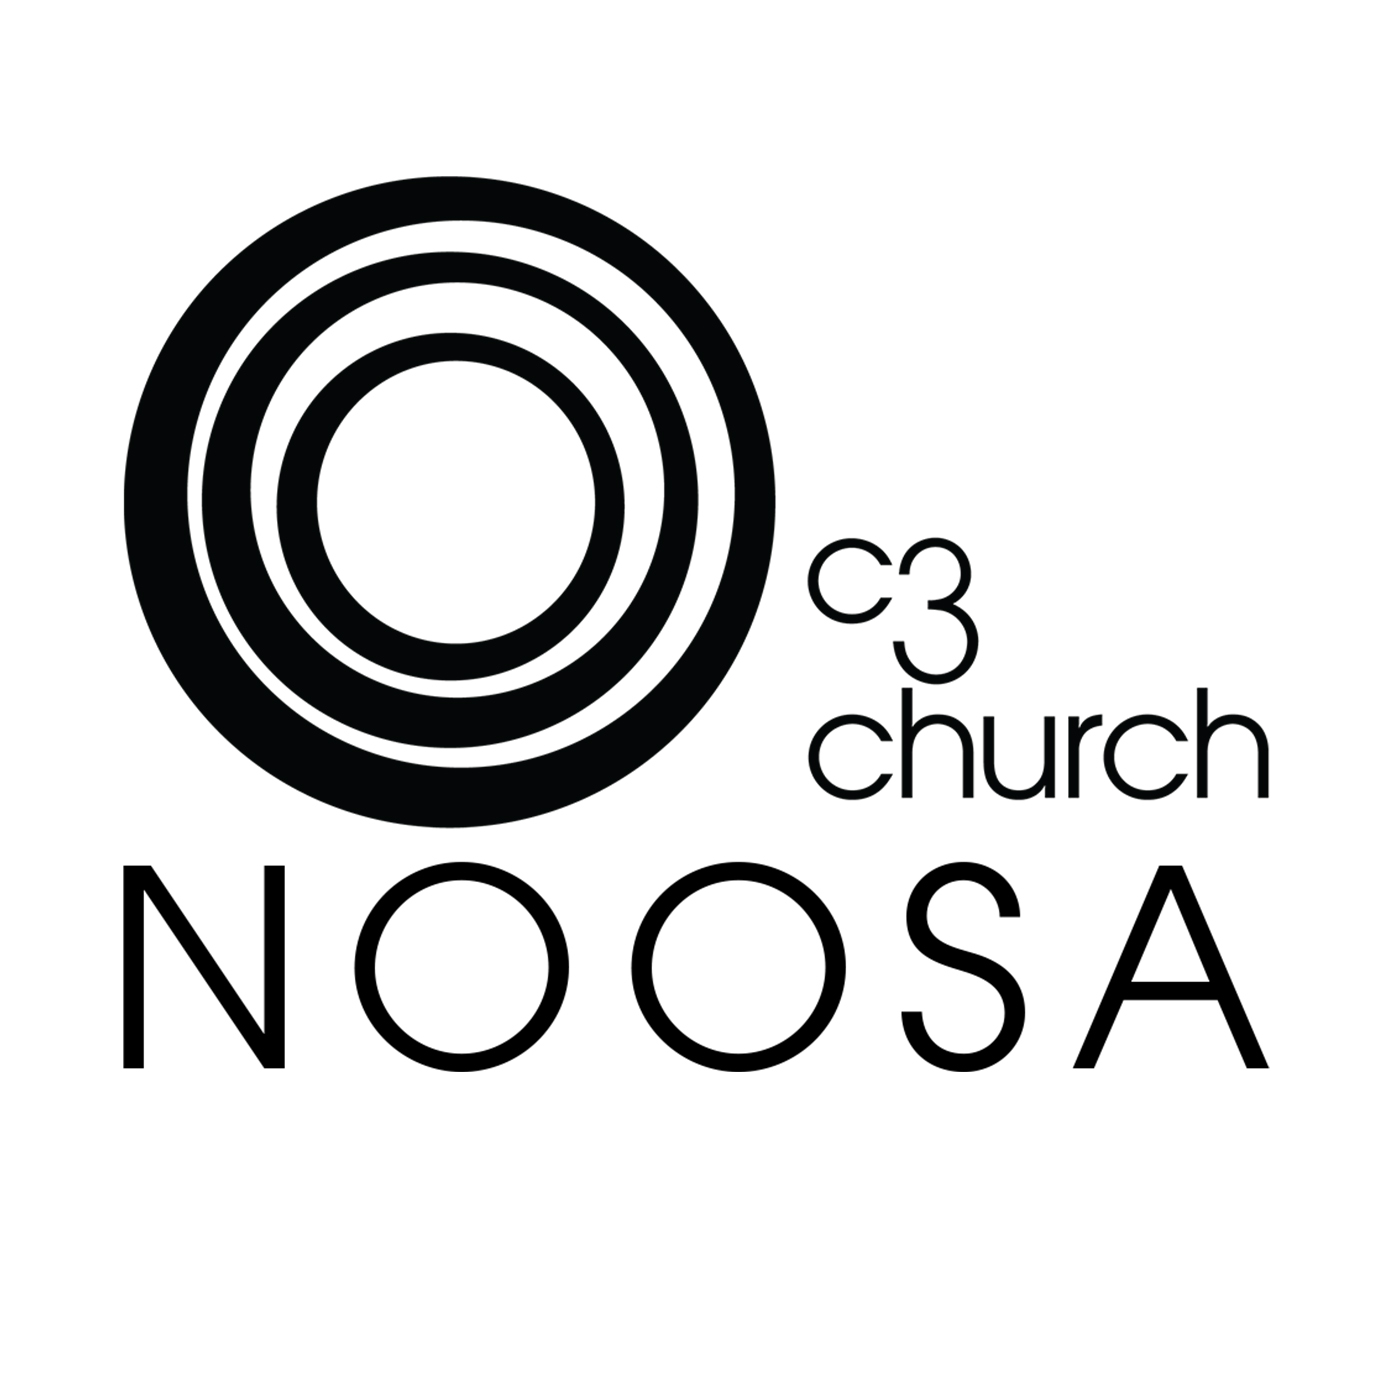 C3 Church Noosa